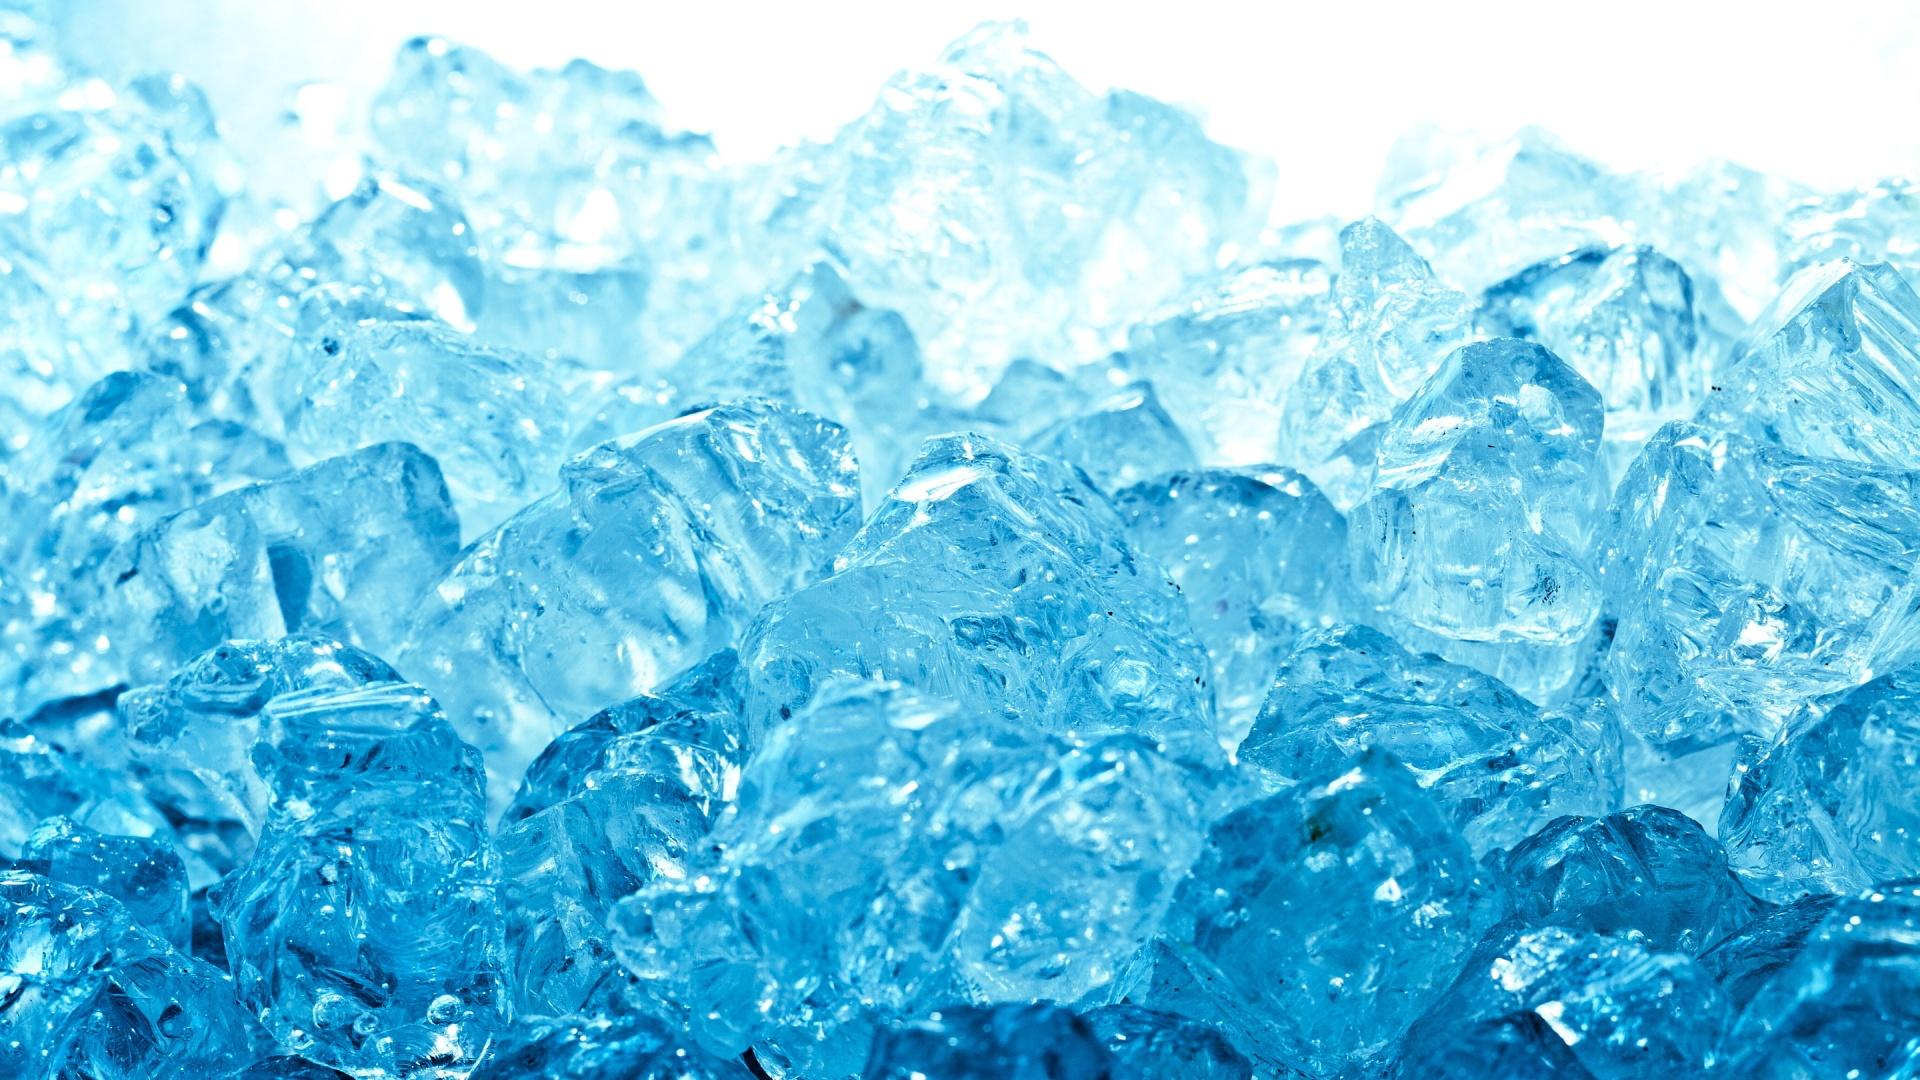 DOWNLOAD DESKTOP BACKGROUND: Ice Background - FULL SIZE ...